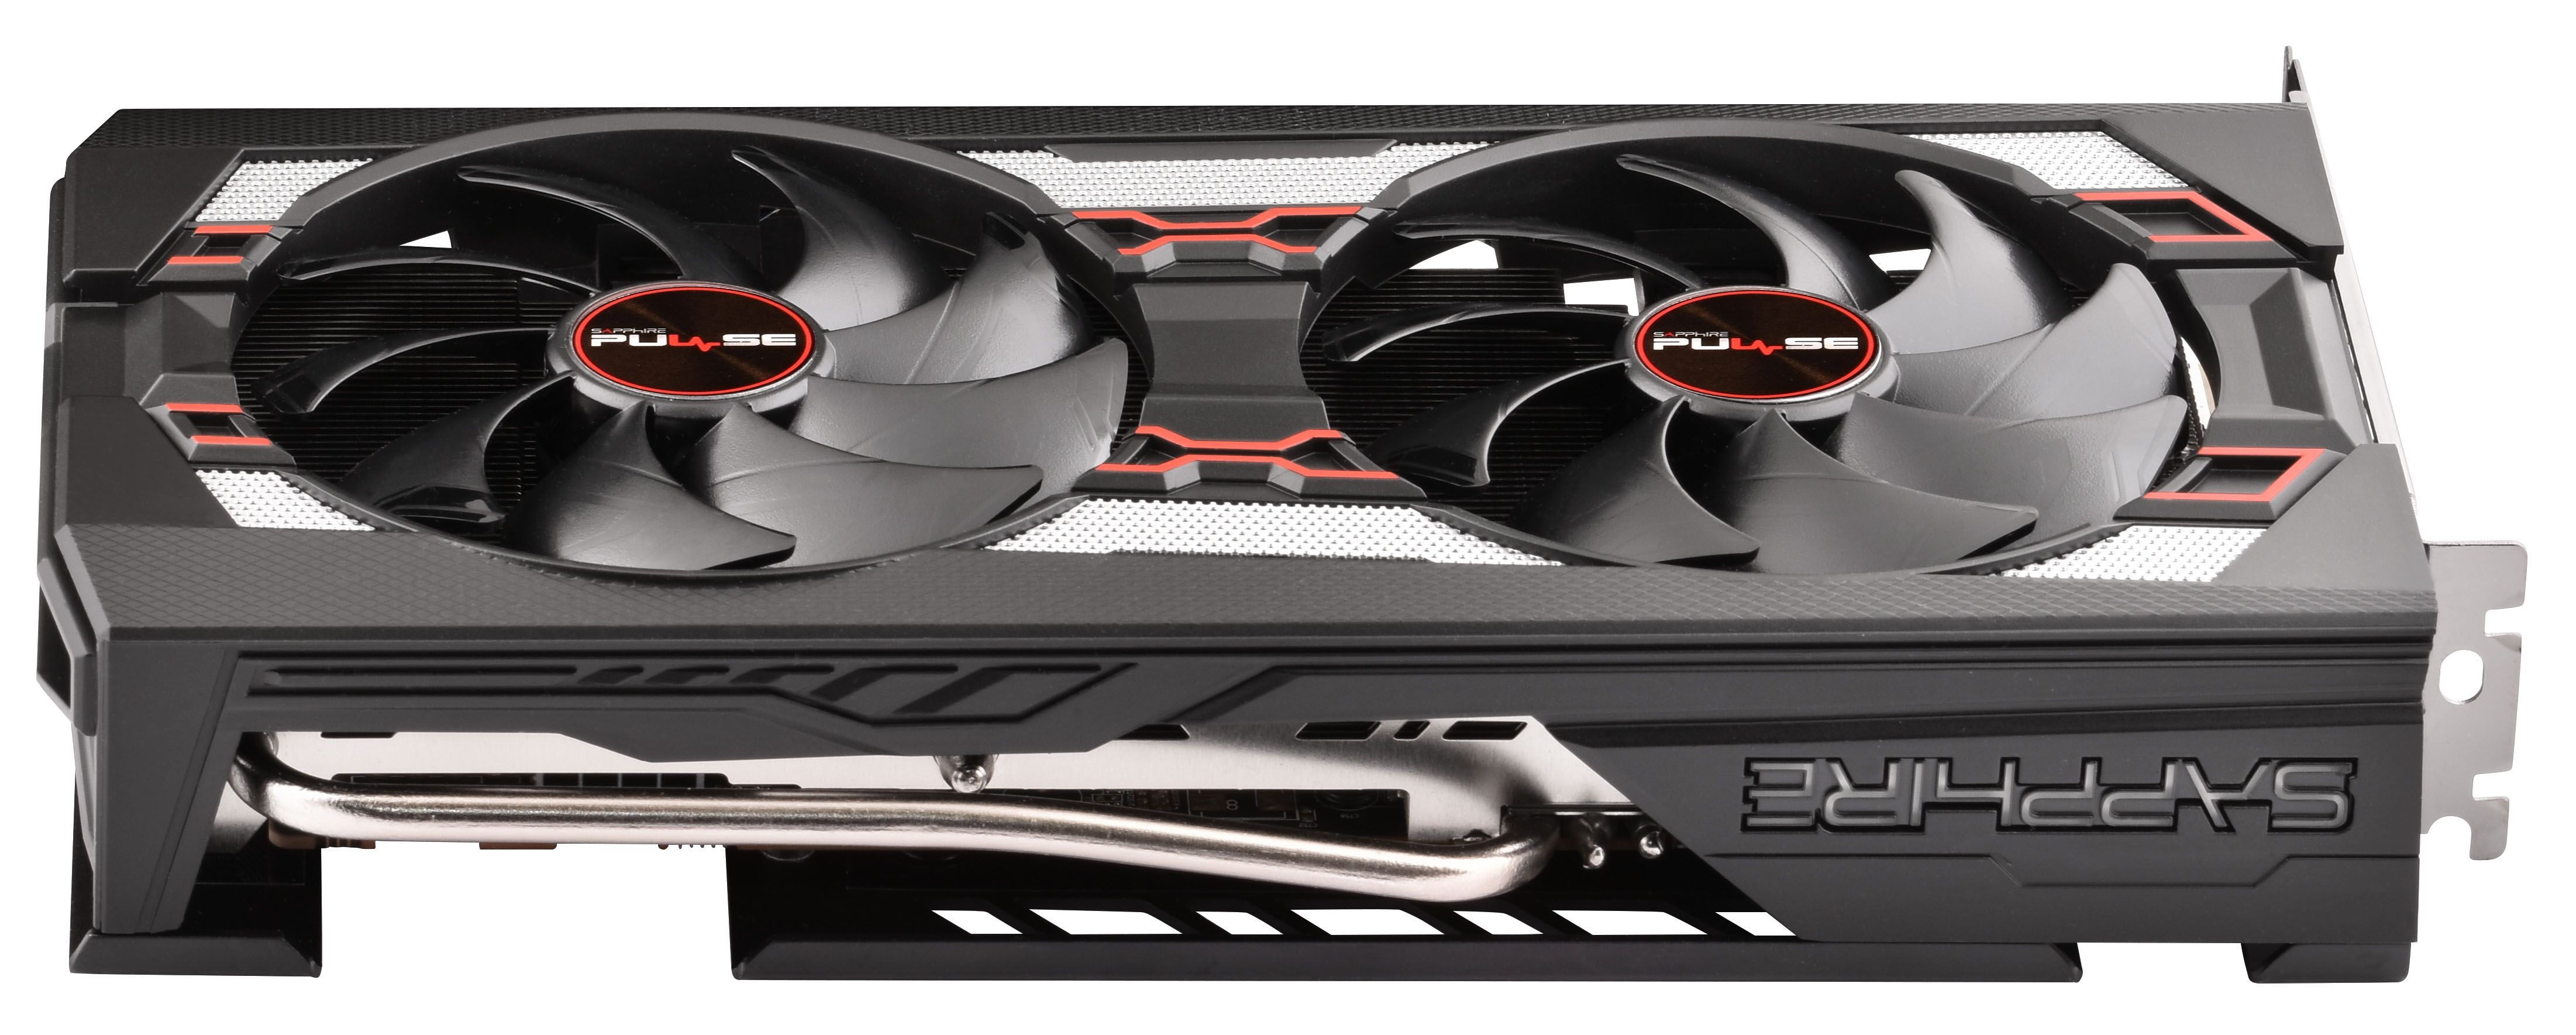 Sapphire-Radeon-RX-5600-XT-Pulse - 3